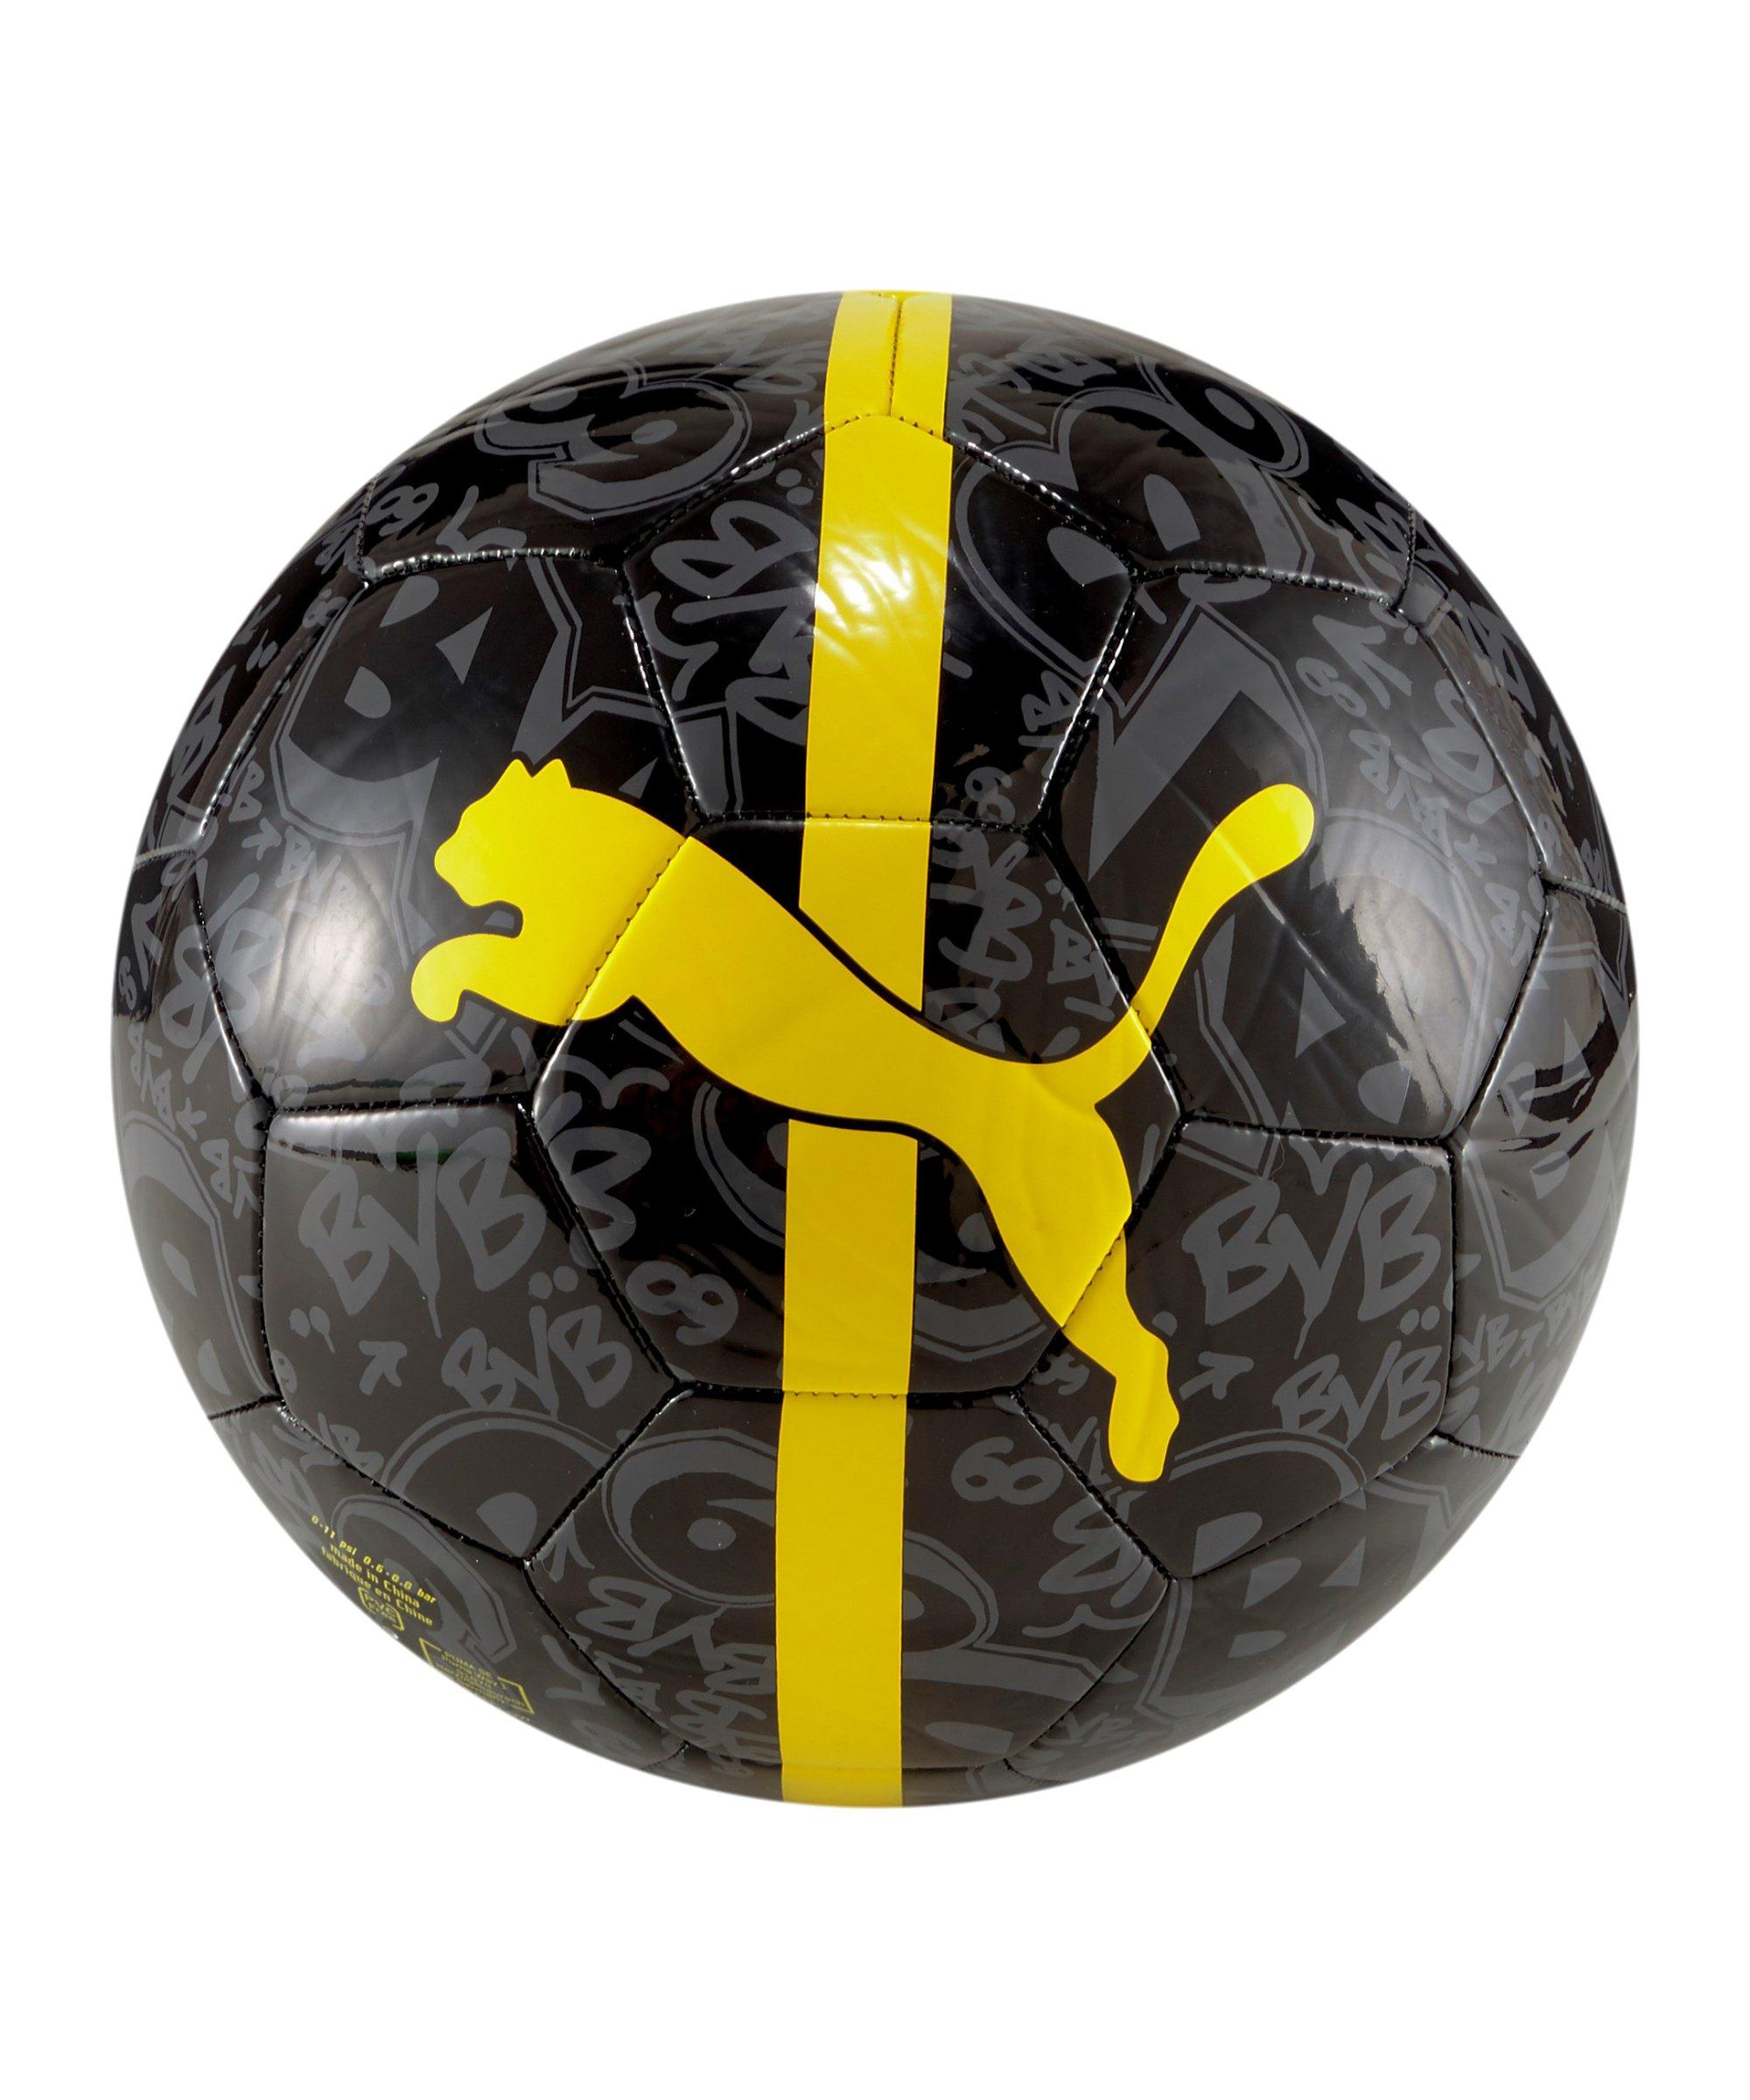 PUMA BVB Dortmund ftblCore Fanball Schwarz F002 - schwarz